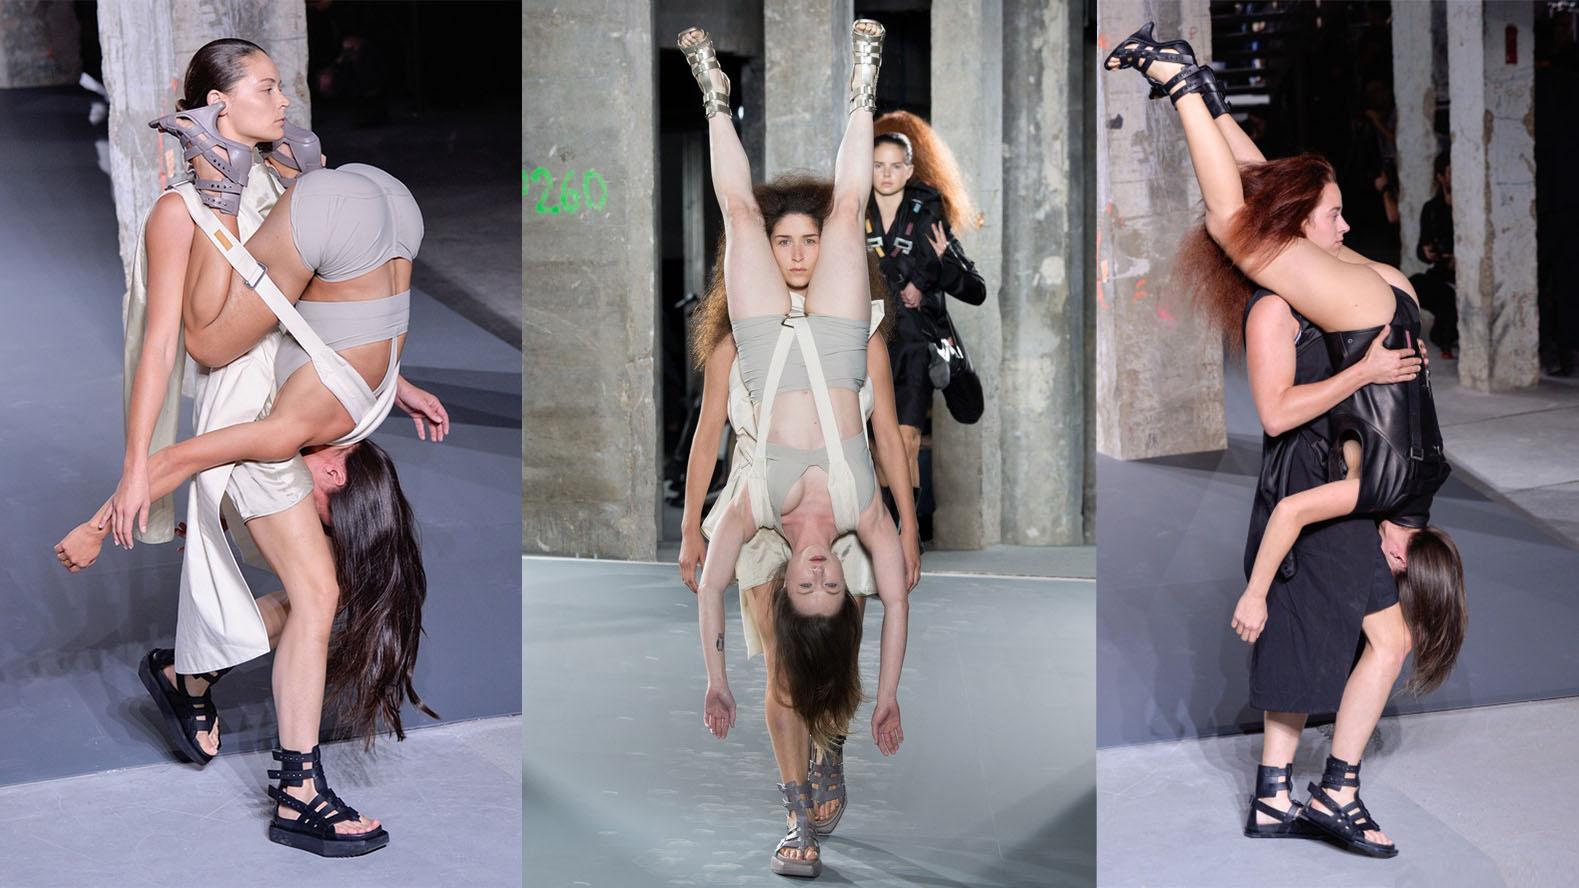 rick owens models carrying models as backpacks Paris Fashion Week SS16